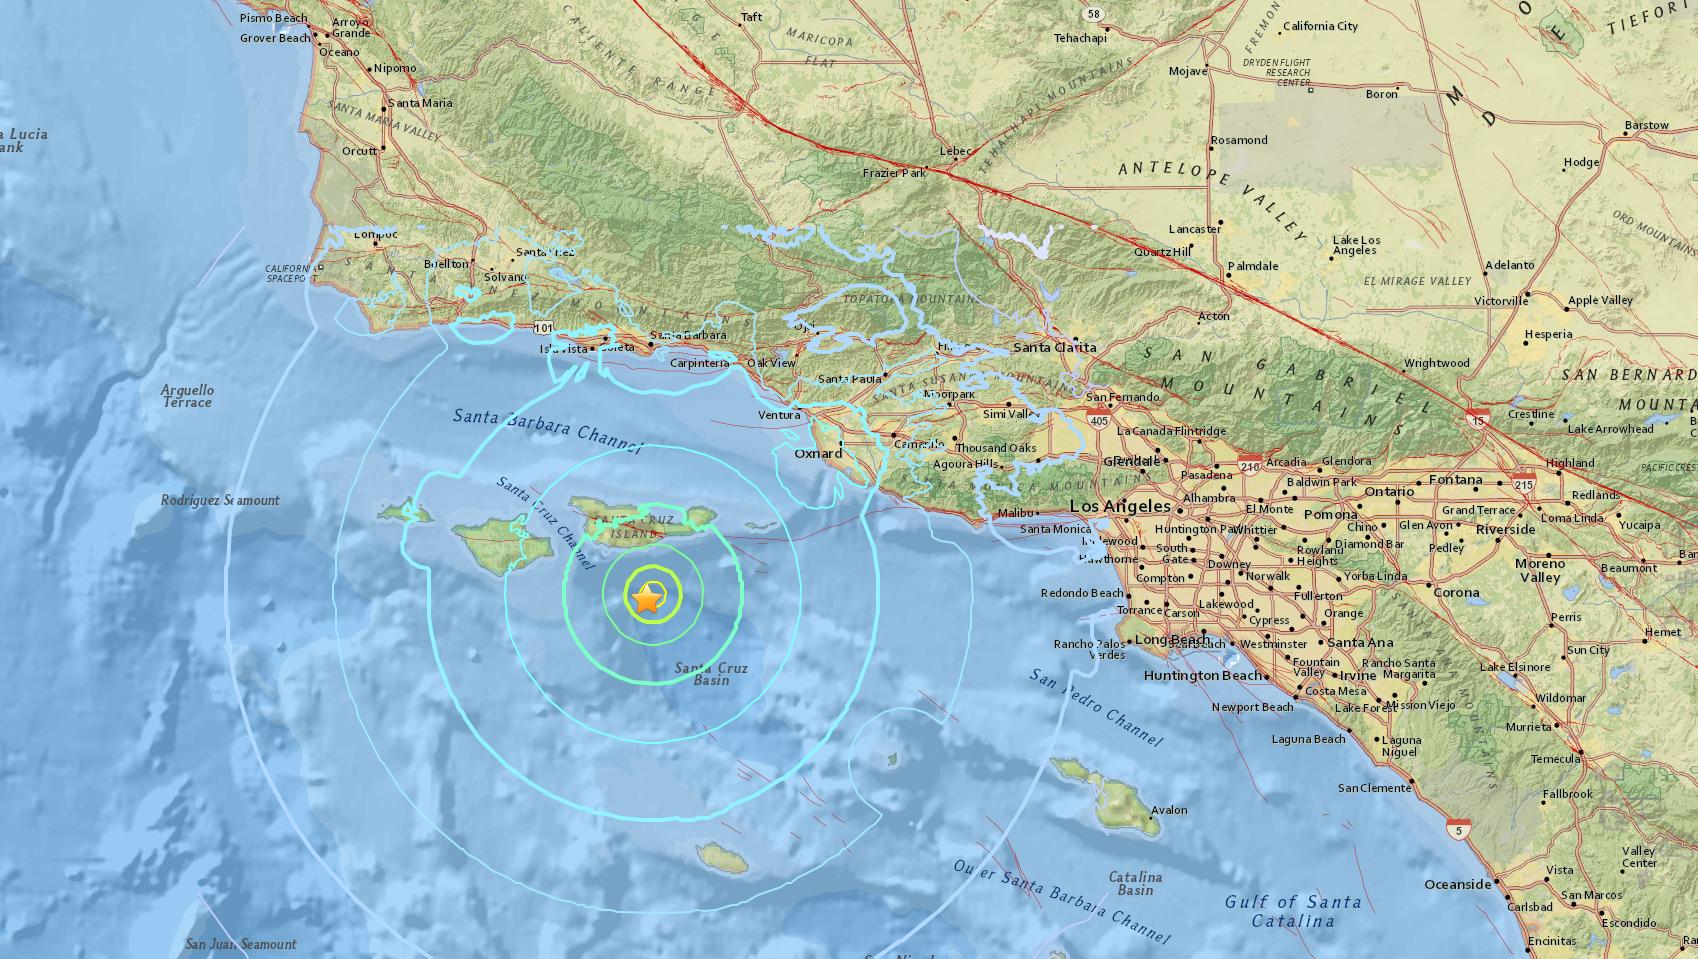 Los Angeles Earthquake Today Magnitude 53 Quake Strikes Near